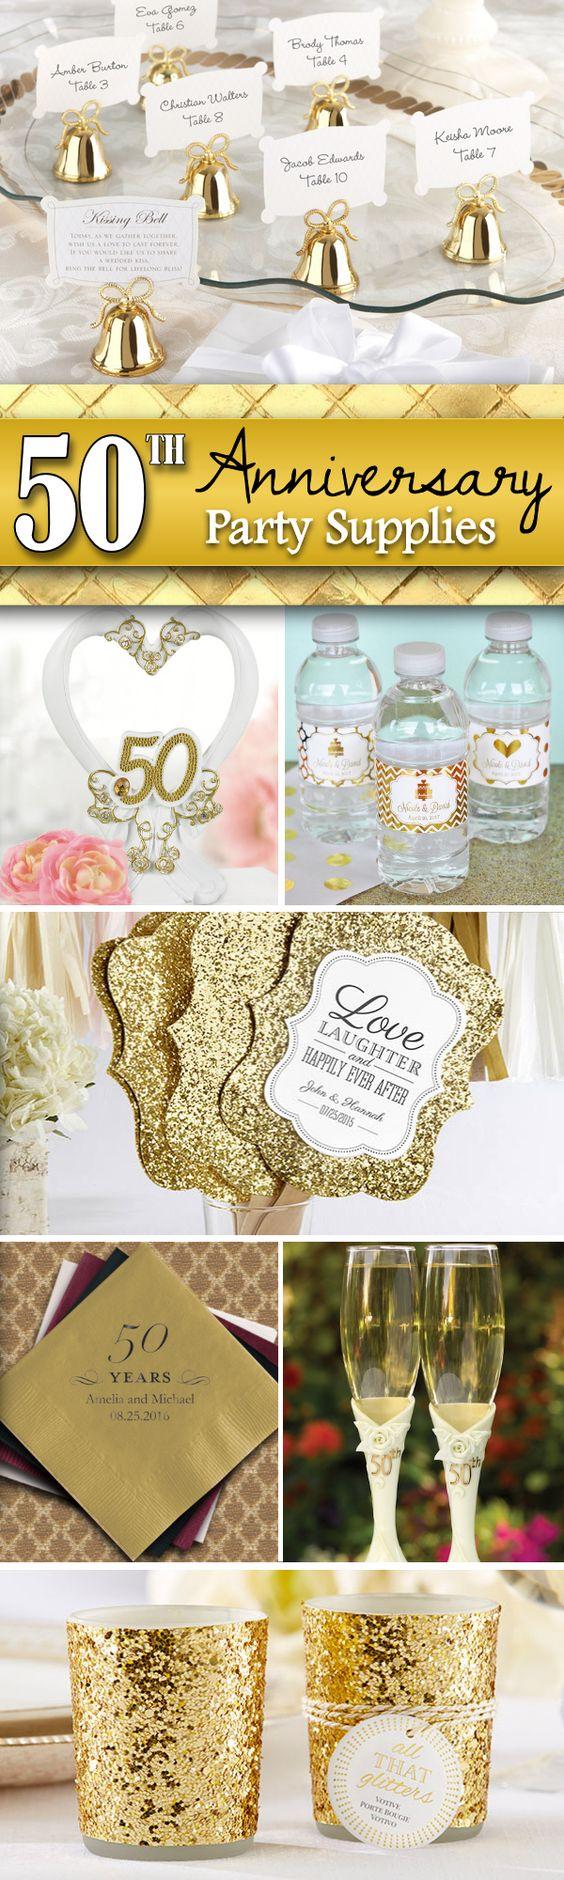 50th Wedding Anniversary Anniversary Parties And Golden Anniversary On Pinterest